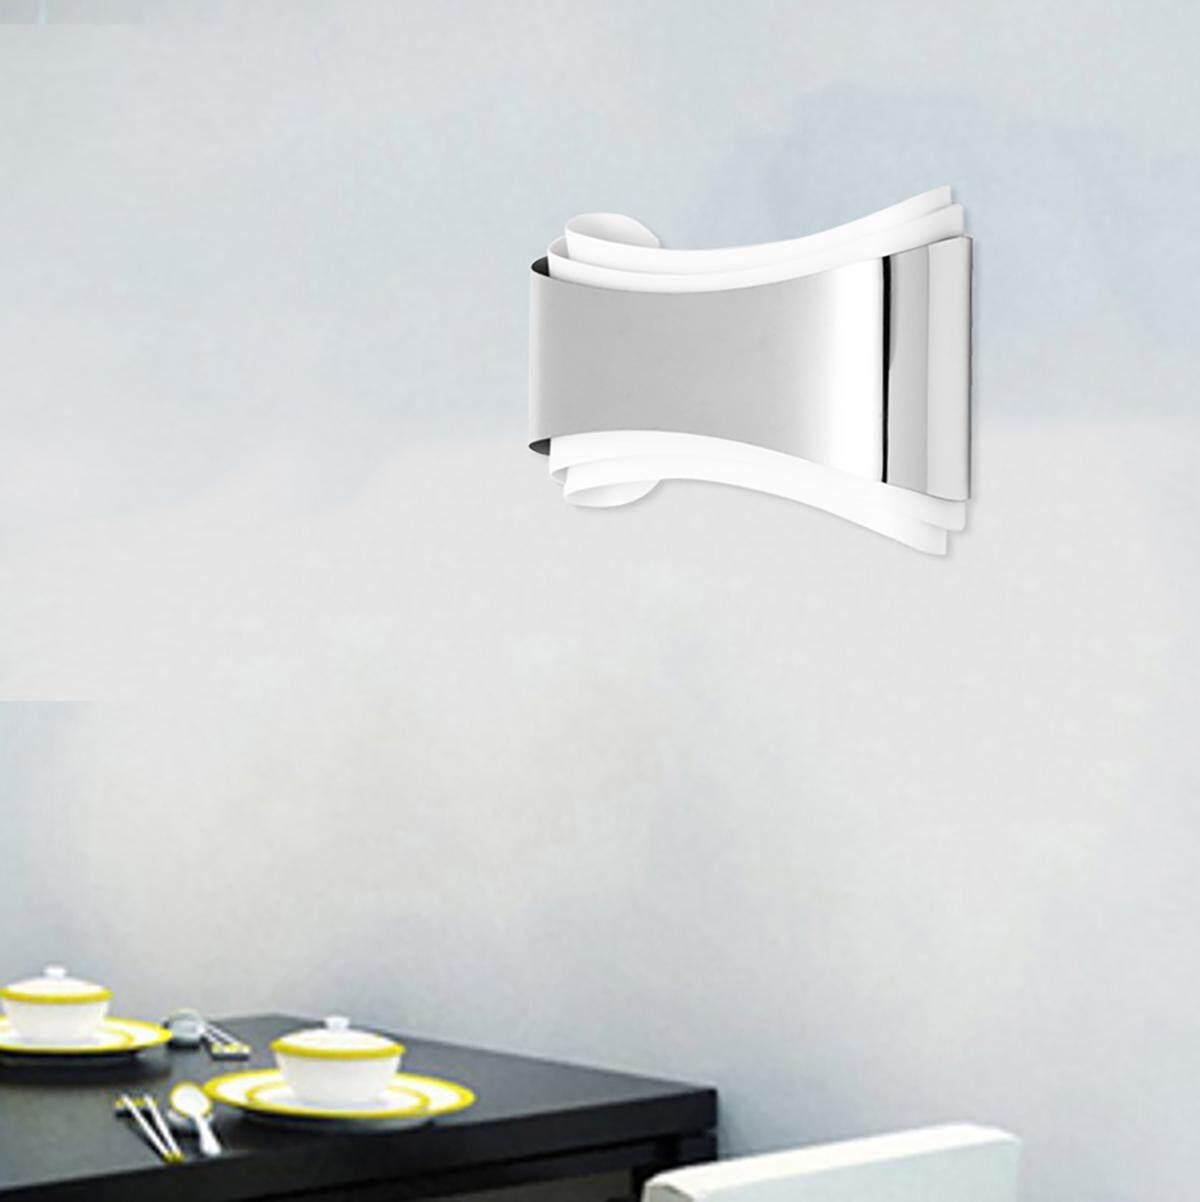 Modern Acrylic 6W LED Wall Lights Sconce Aisle/Porch lights wall Lamp 1365HC White light